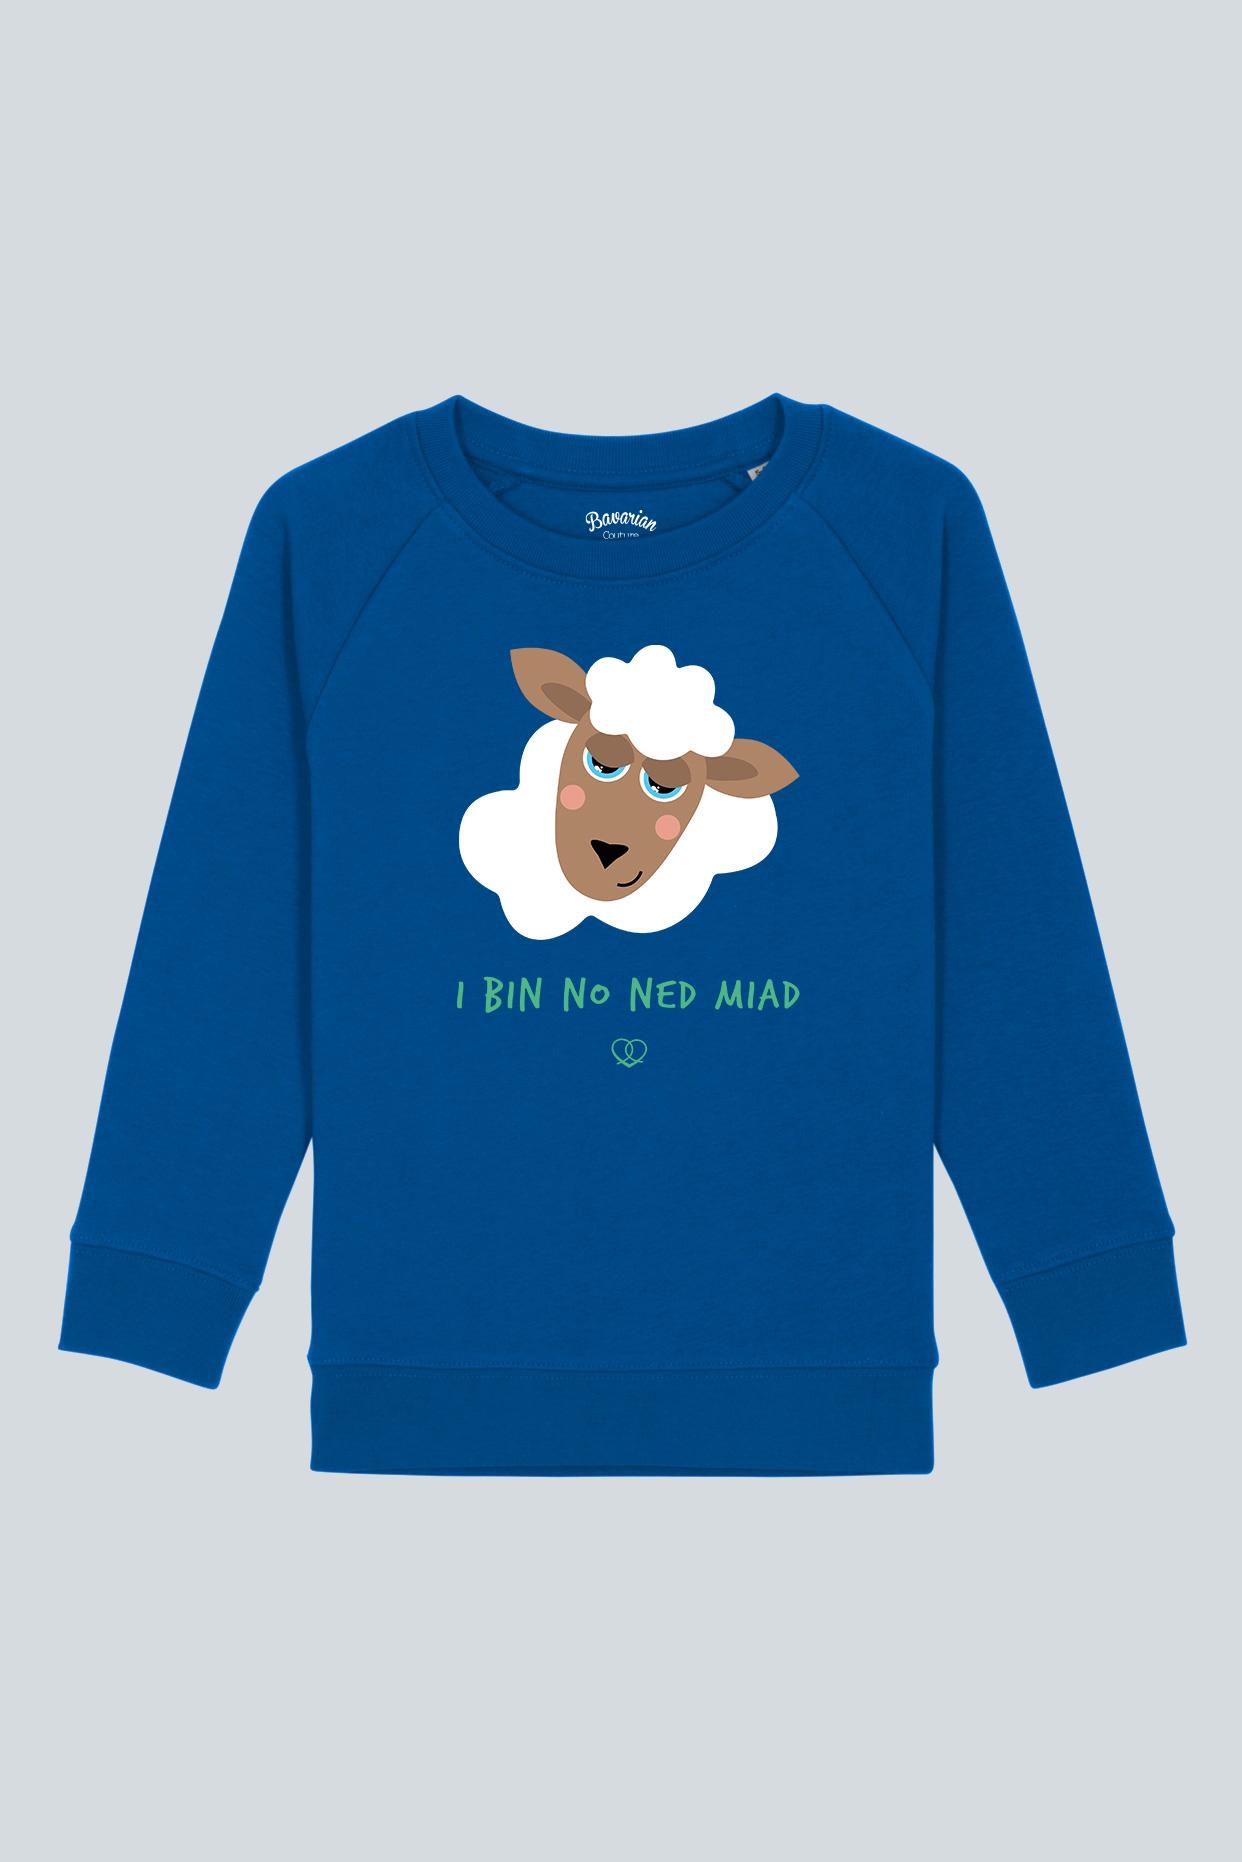 Kidssweater miads Schafal